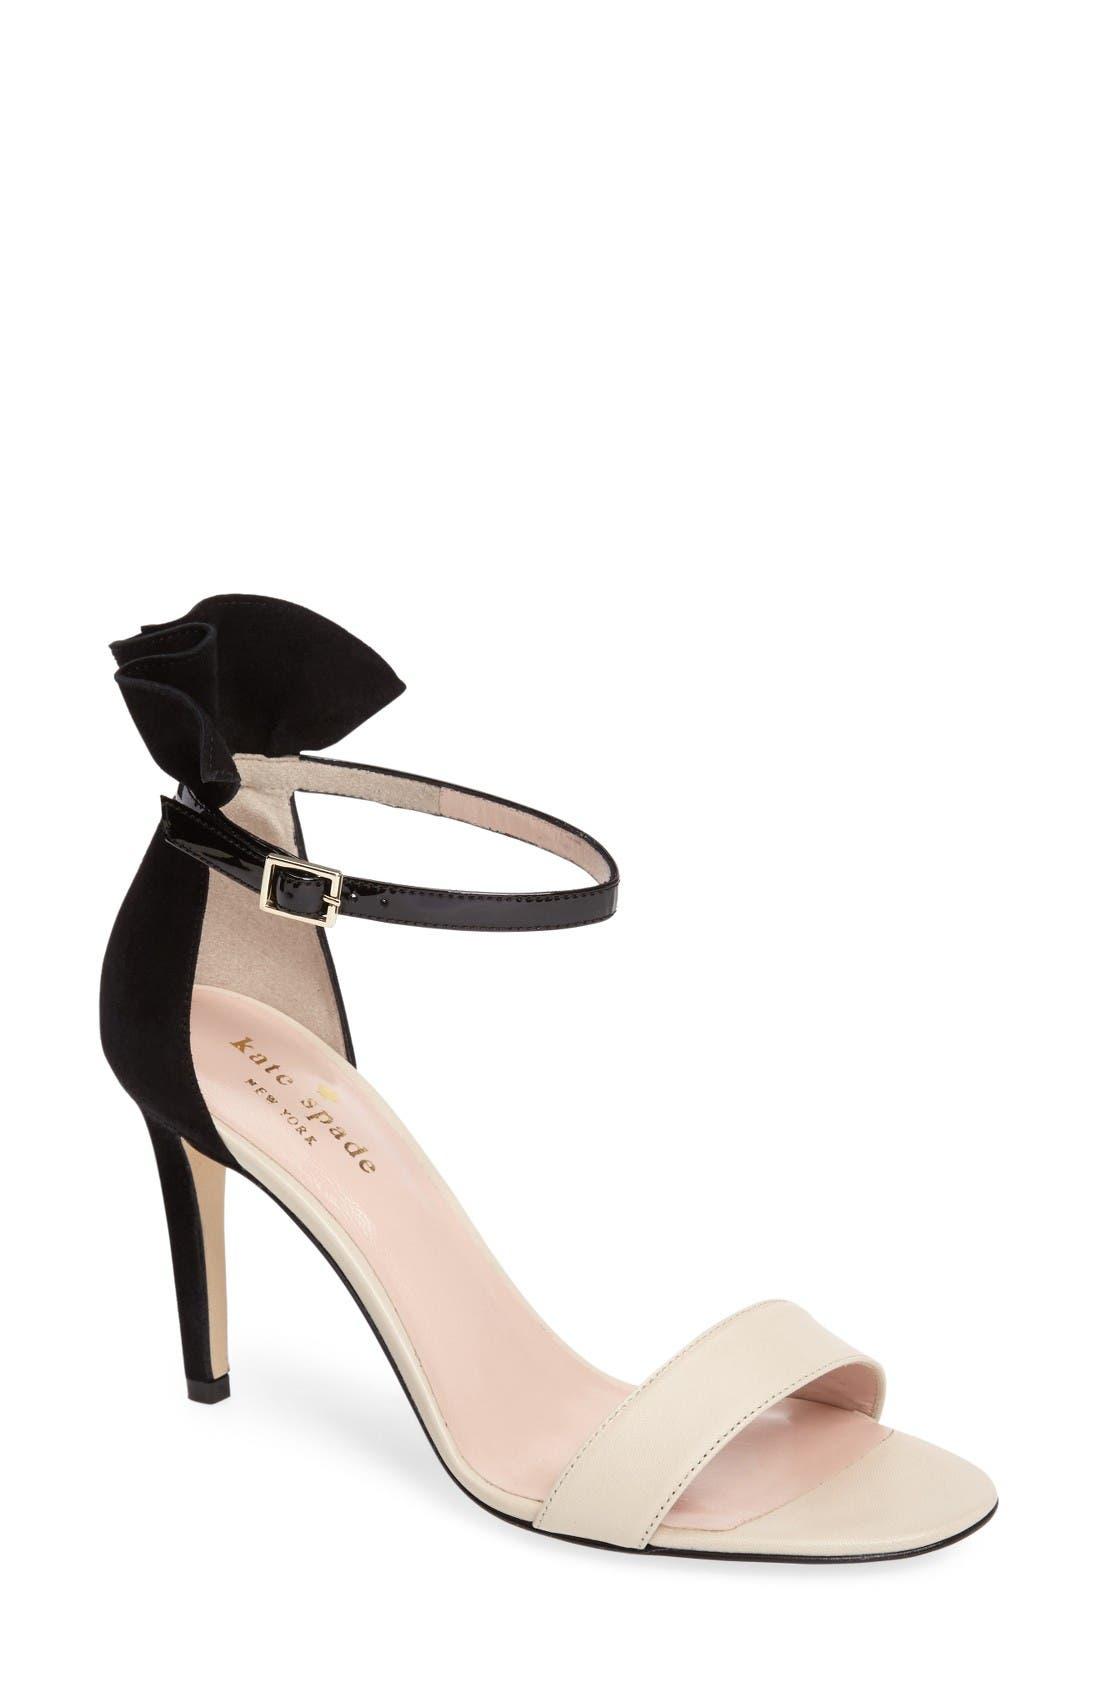 KATE SPADE NEW YORK iris ankle strap sandal